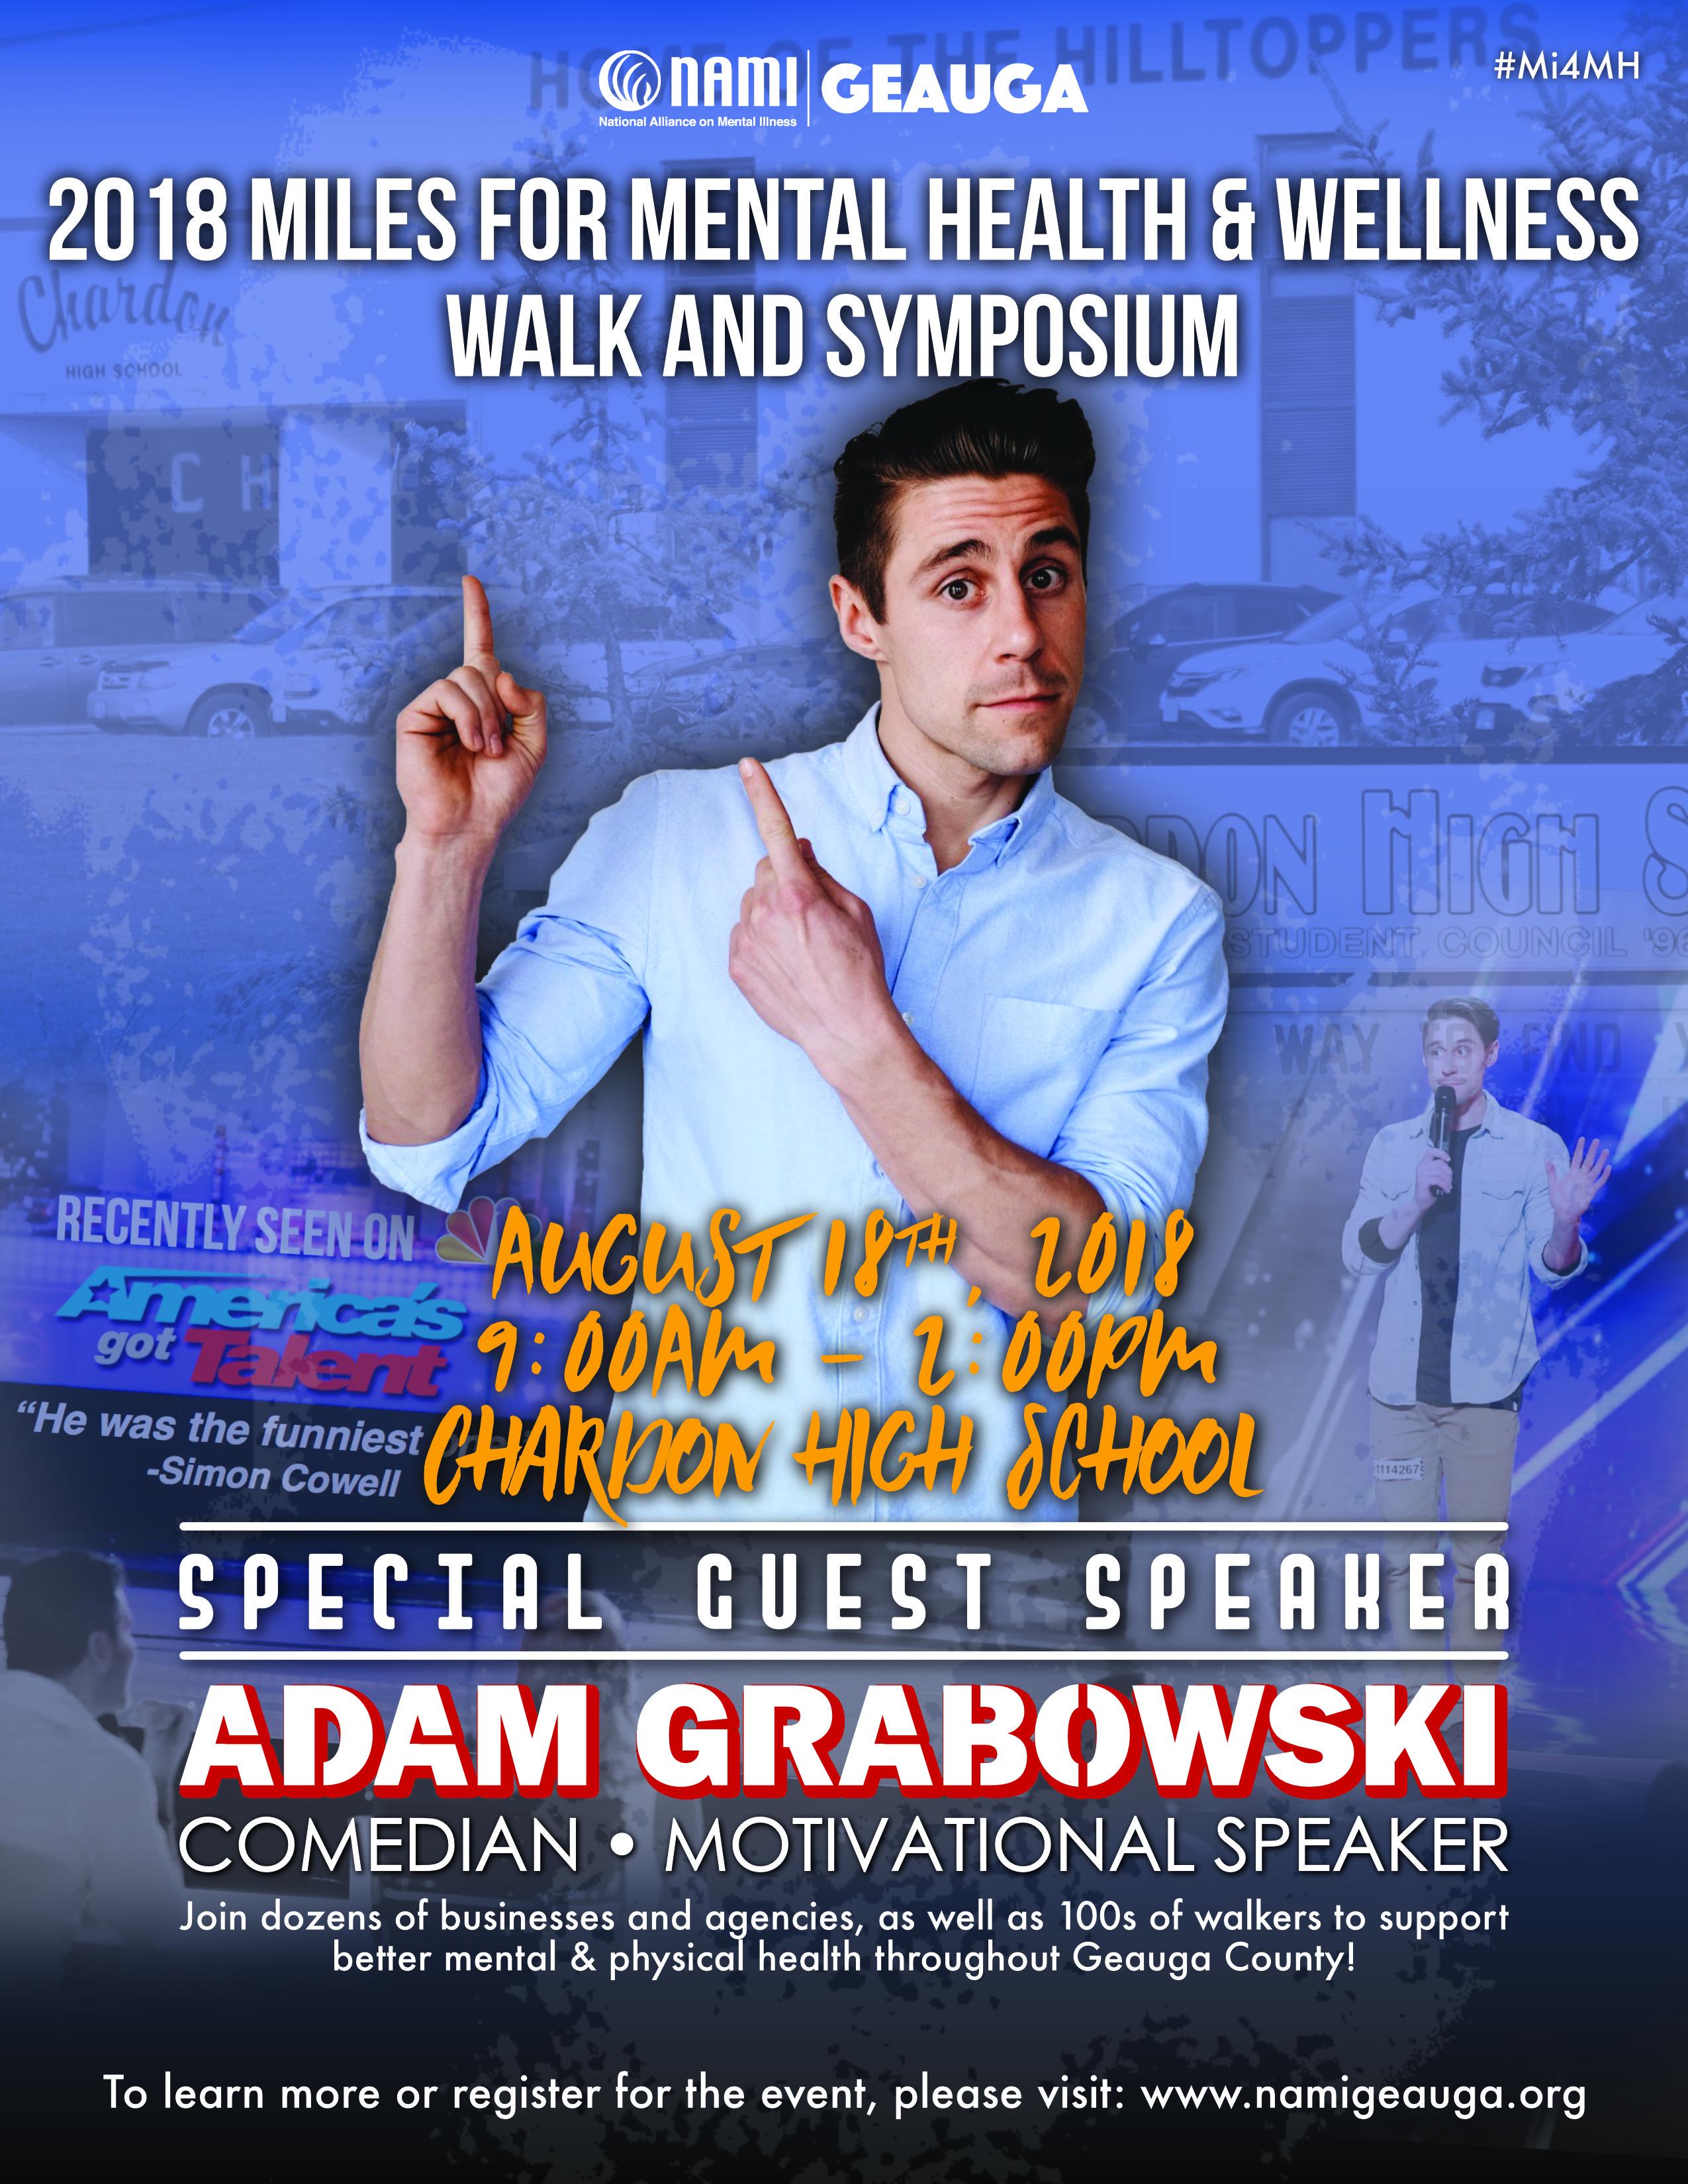 special guest speaker flyer dejohn funeral homes crematory